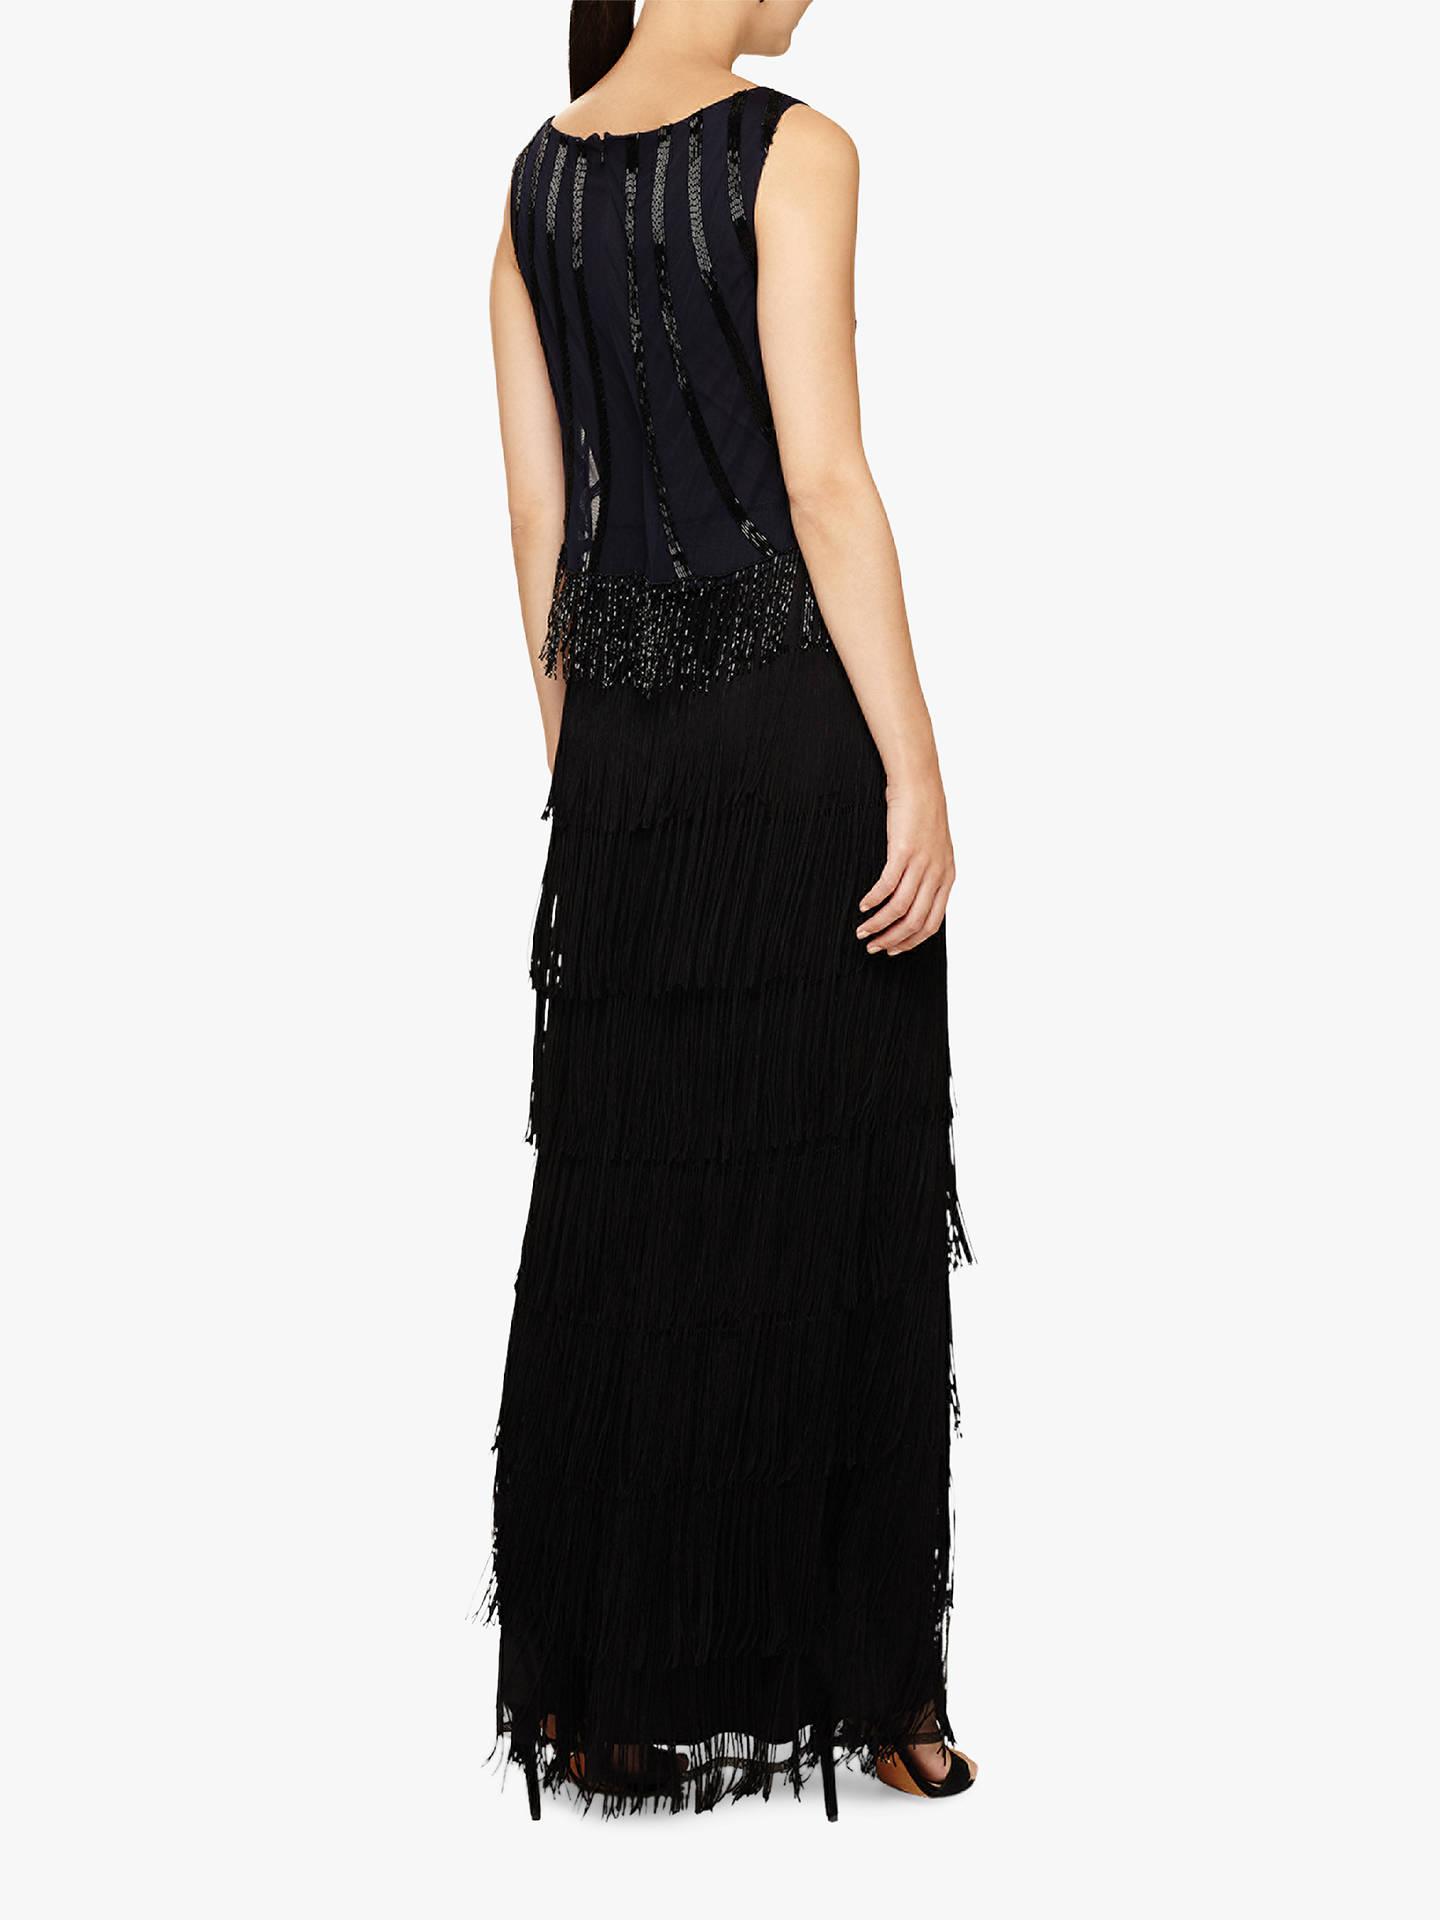 6a27ea0d193 ... Buy Phase Eight Viola Fringe Embellished Maxi Dress